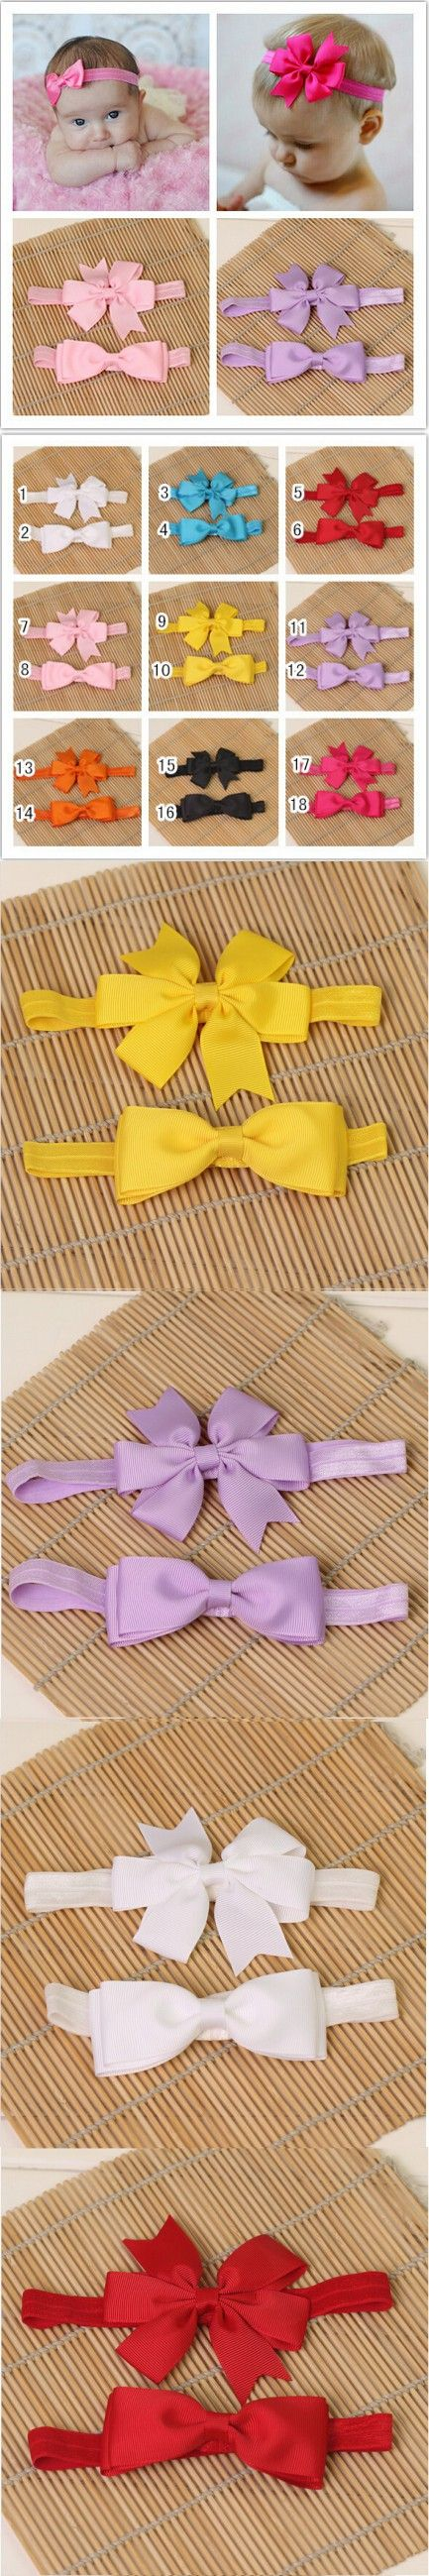 Baby girl kids elastics hair head bands flower satin ribbon bows headband accessories for newborns hair wrap hairband headwear